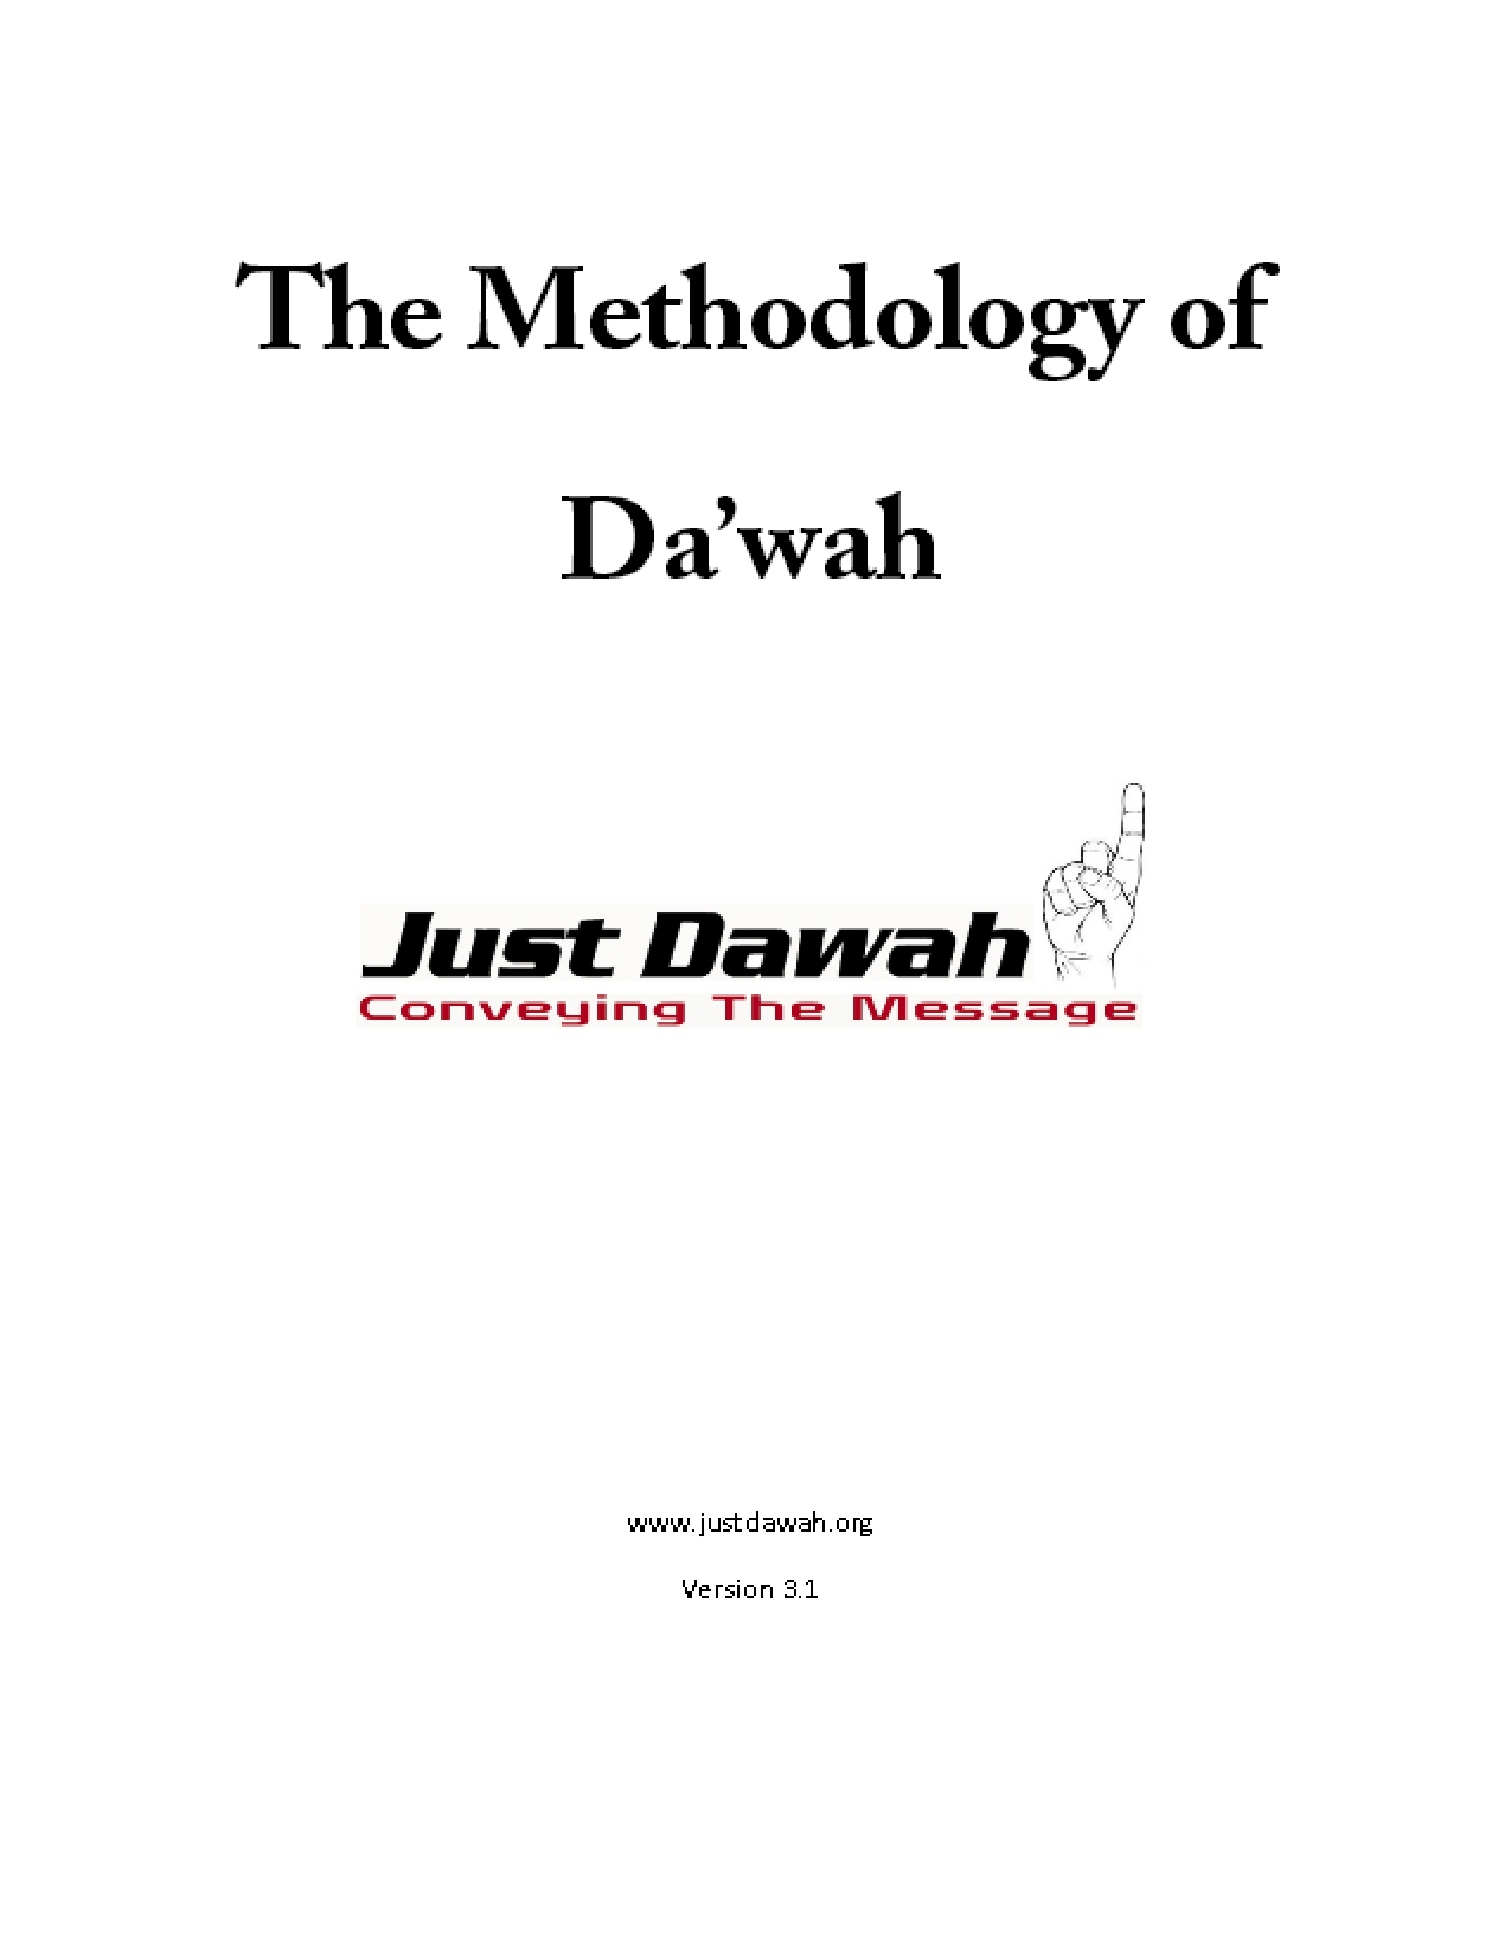 methoddawah.jpg